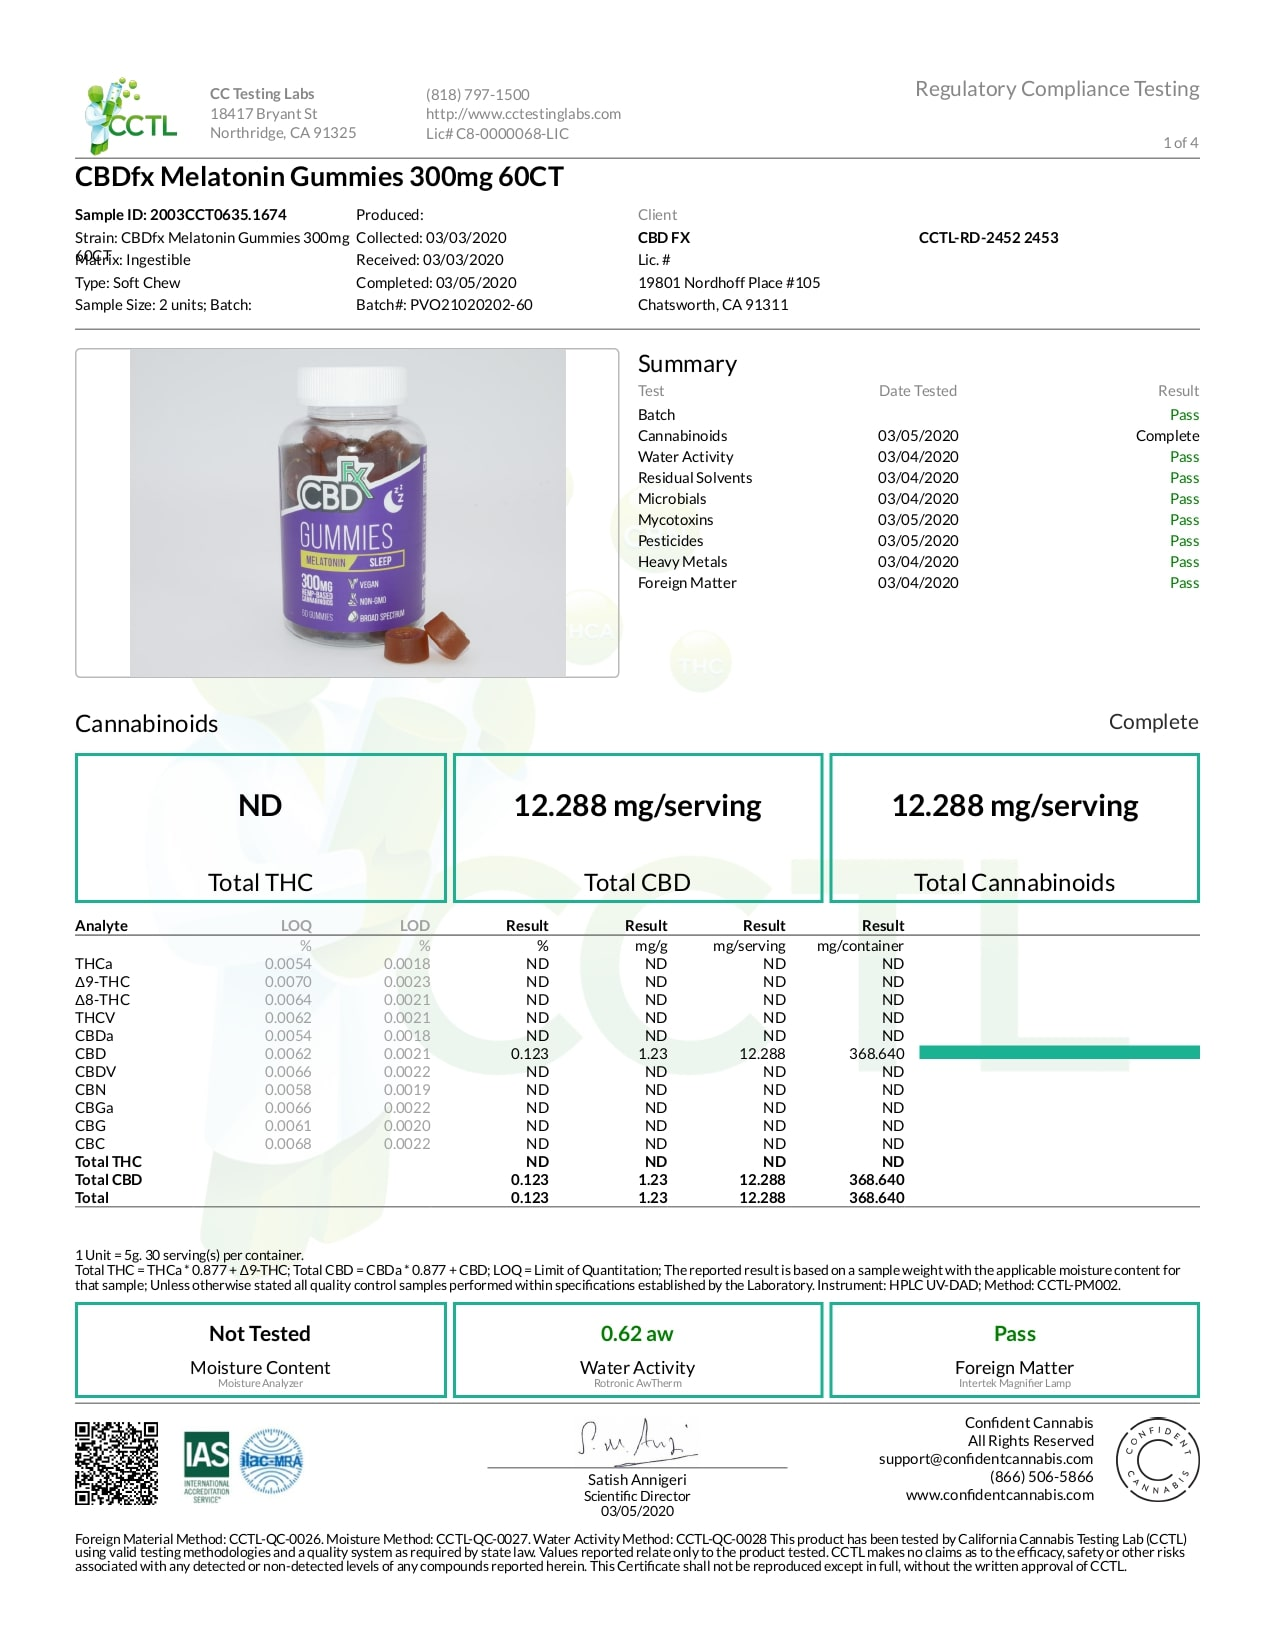 CBDfx CBD Gummies For Sleep With Melatonin Lab Report Broad Spectrum 300mg